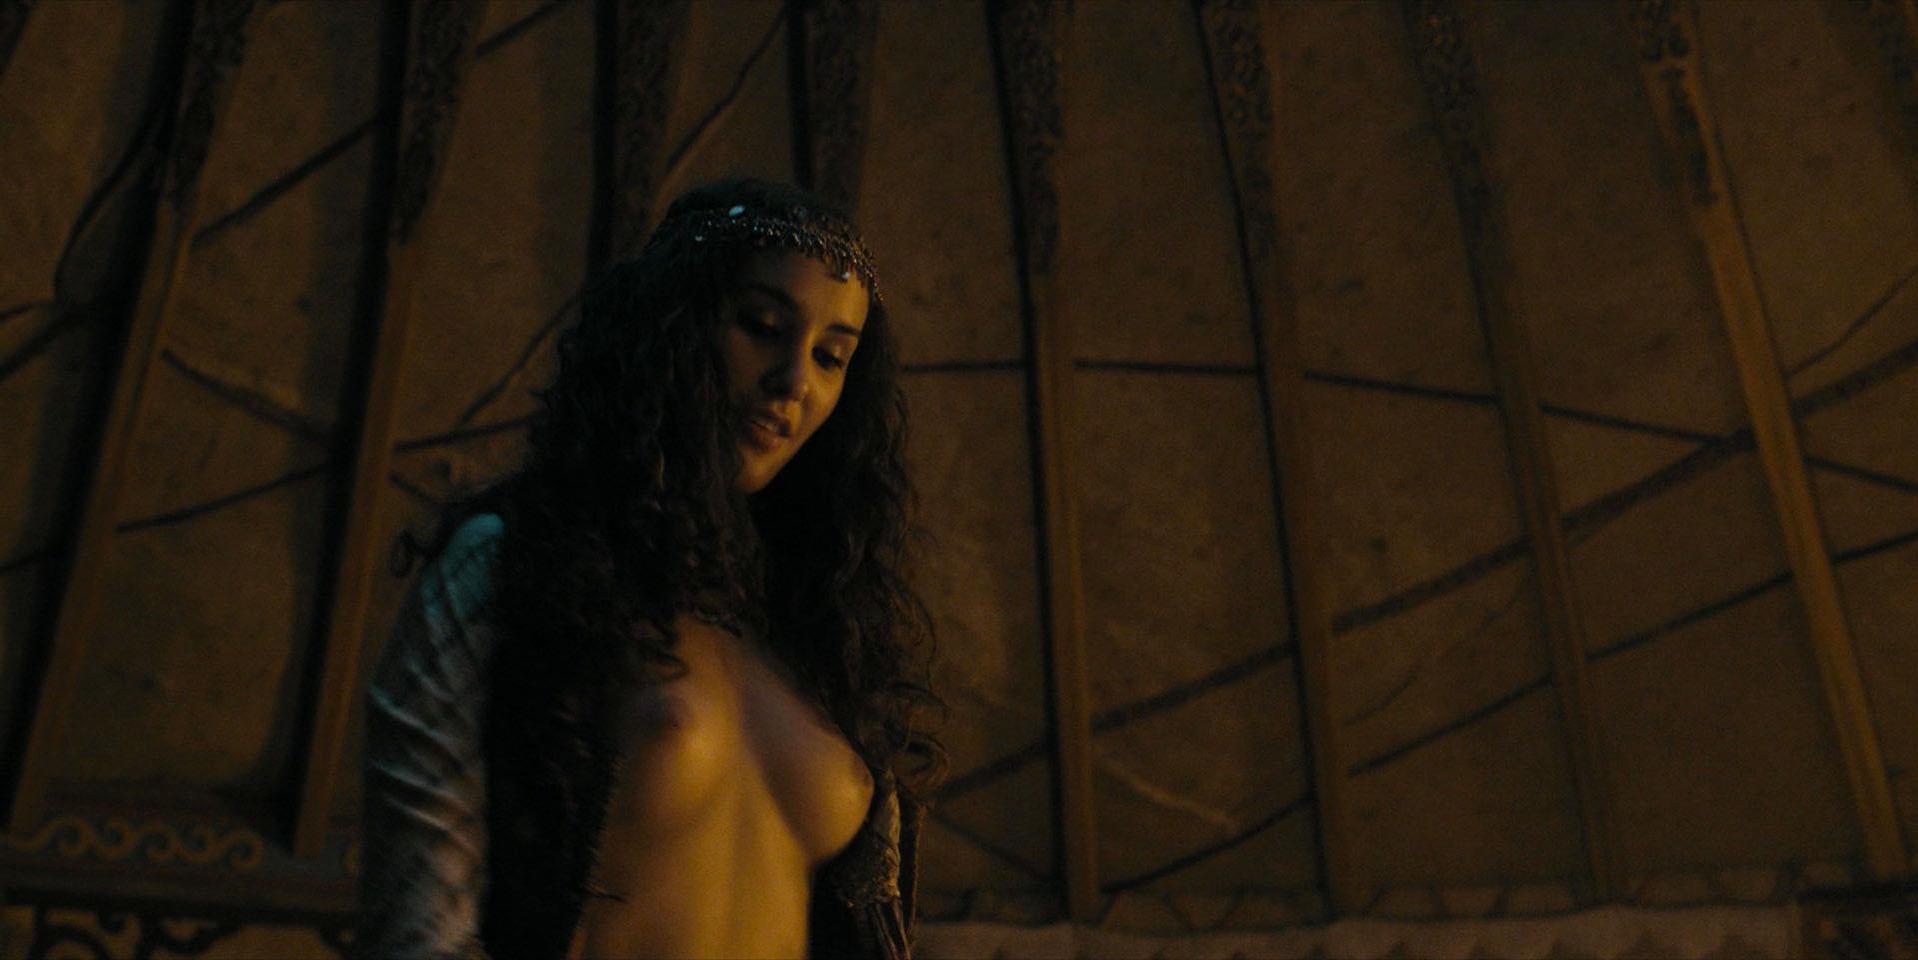 Olivia cheng nude marco polo s01e034 - 2 6